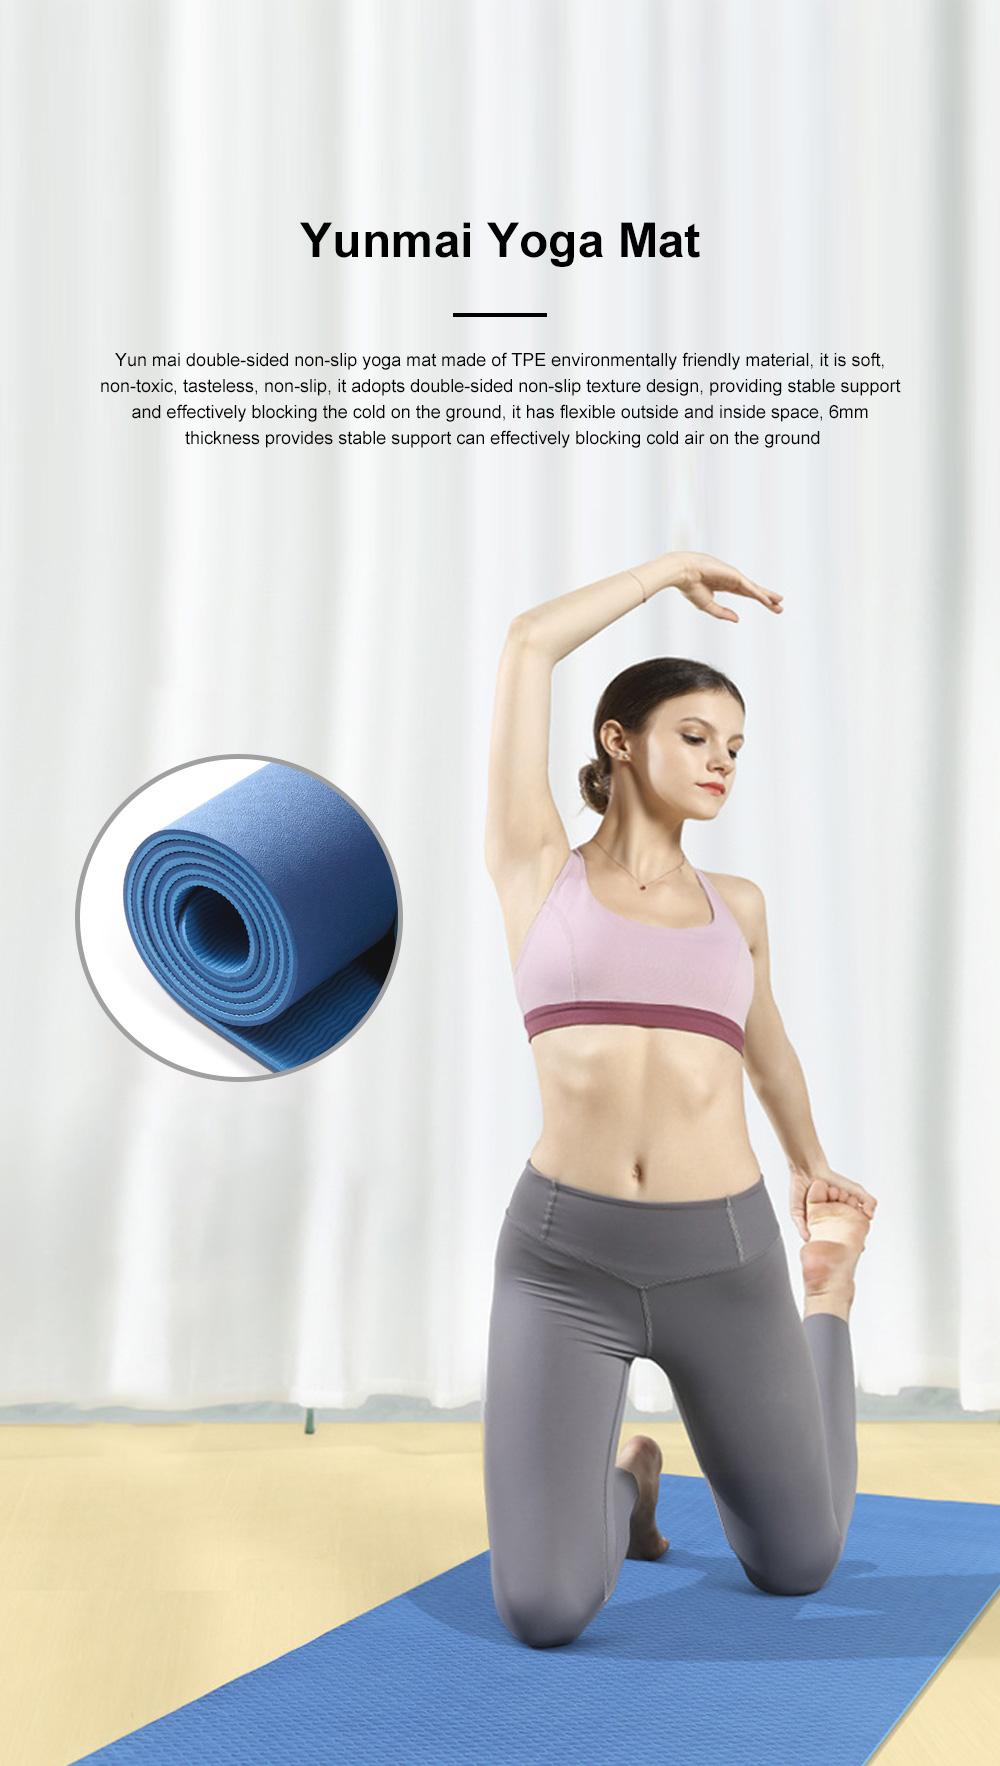 Yunmai Sport Yoga Mat Eco Friendly Durable Yoga Mat Thick Fitness Foldable Travel Exercise Non Slip Yoga Blanket 0